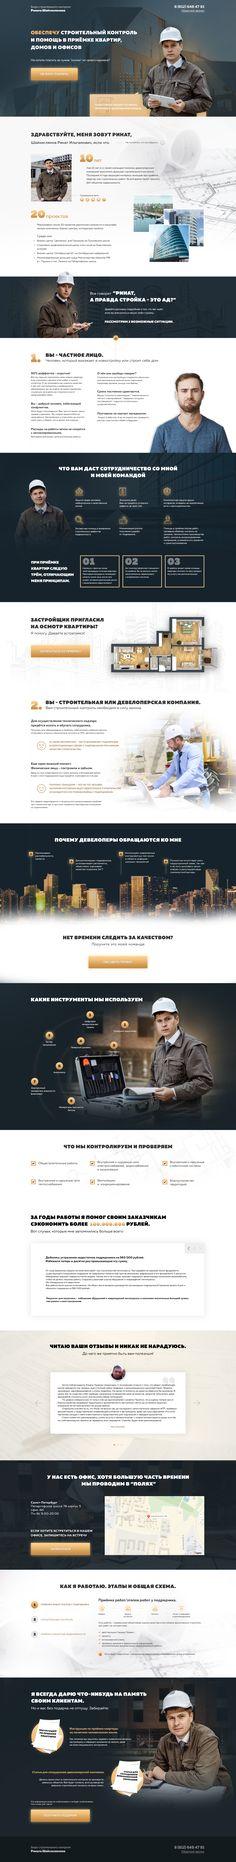 Building control on Behance Ui Ux Design, Homepage Design, Flat Design, Landing Page Builder, Landing Page Design, Website Design Inspiration, Ui Inspiration, Design Ideas, Landing Page Examples